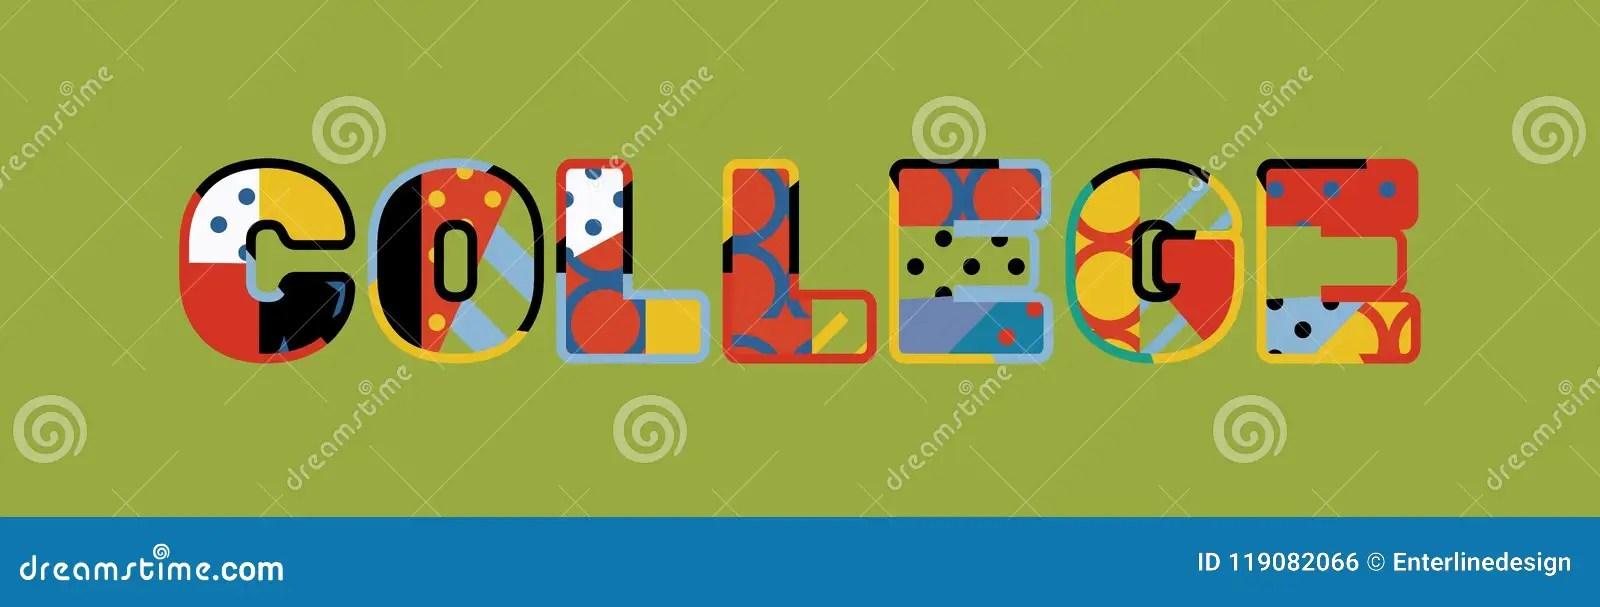 College Concept Word Art Illustration Stock Vector - Illustration of